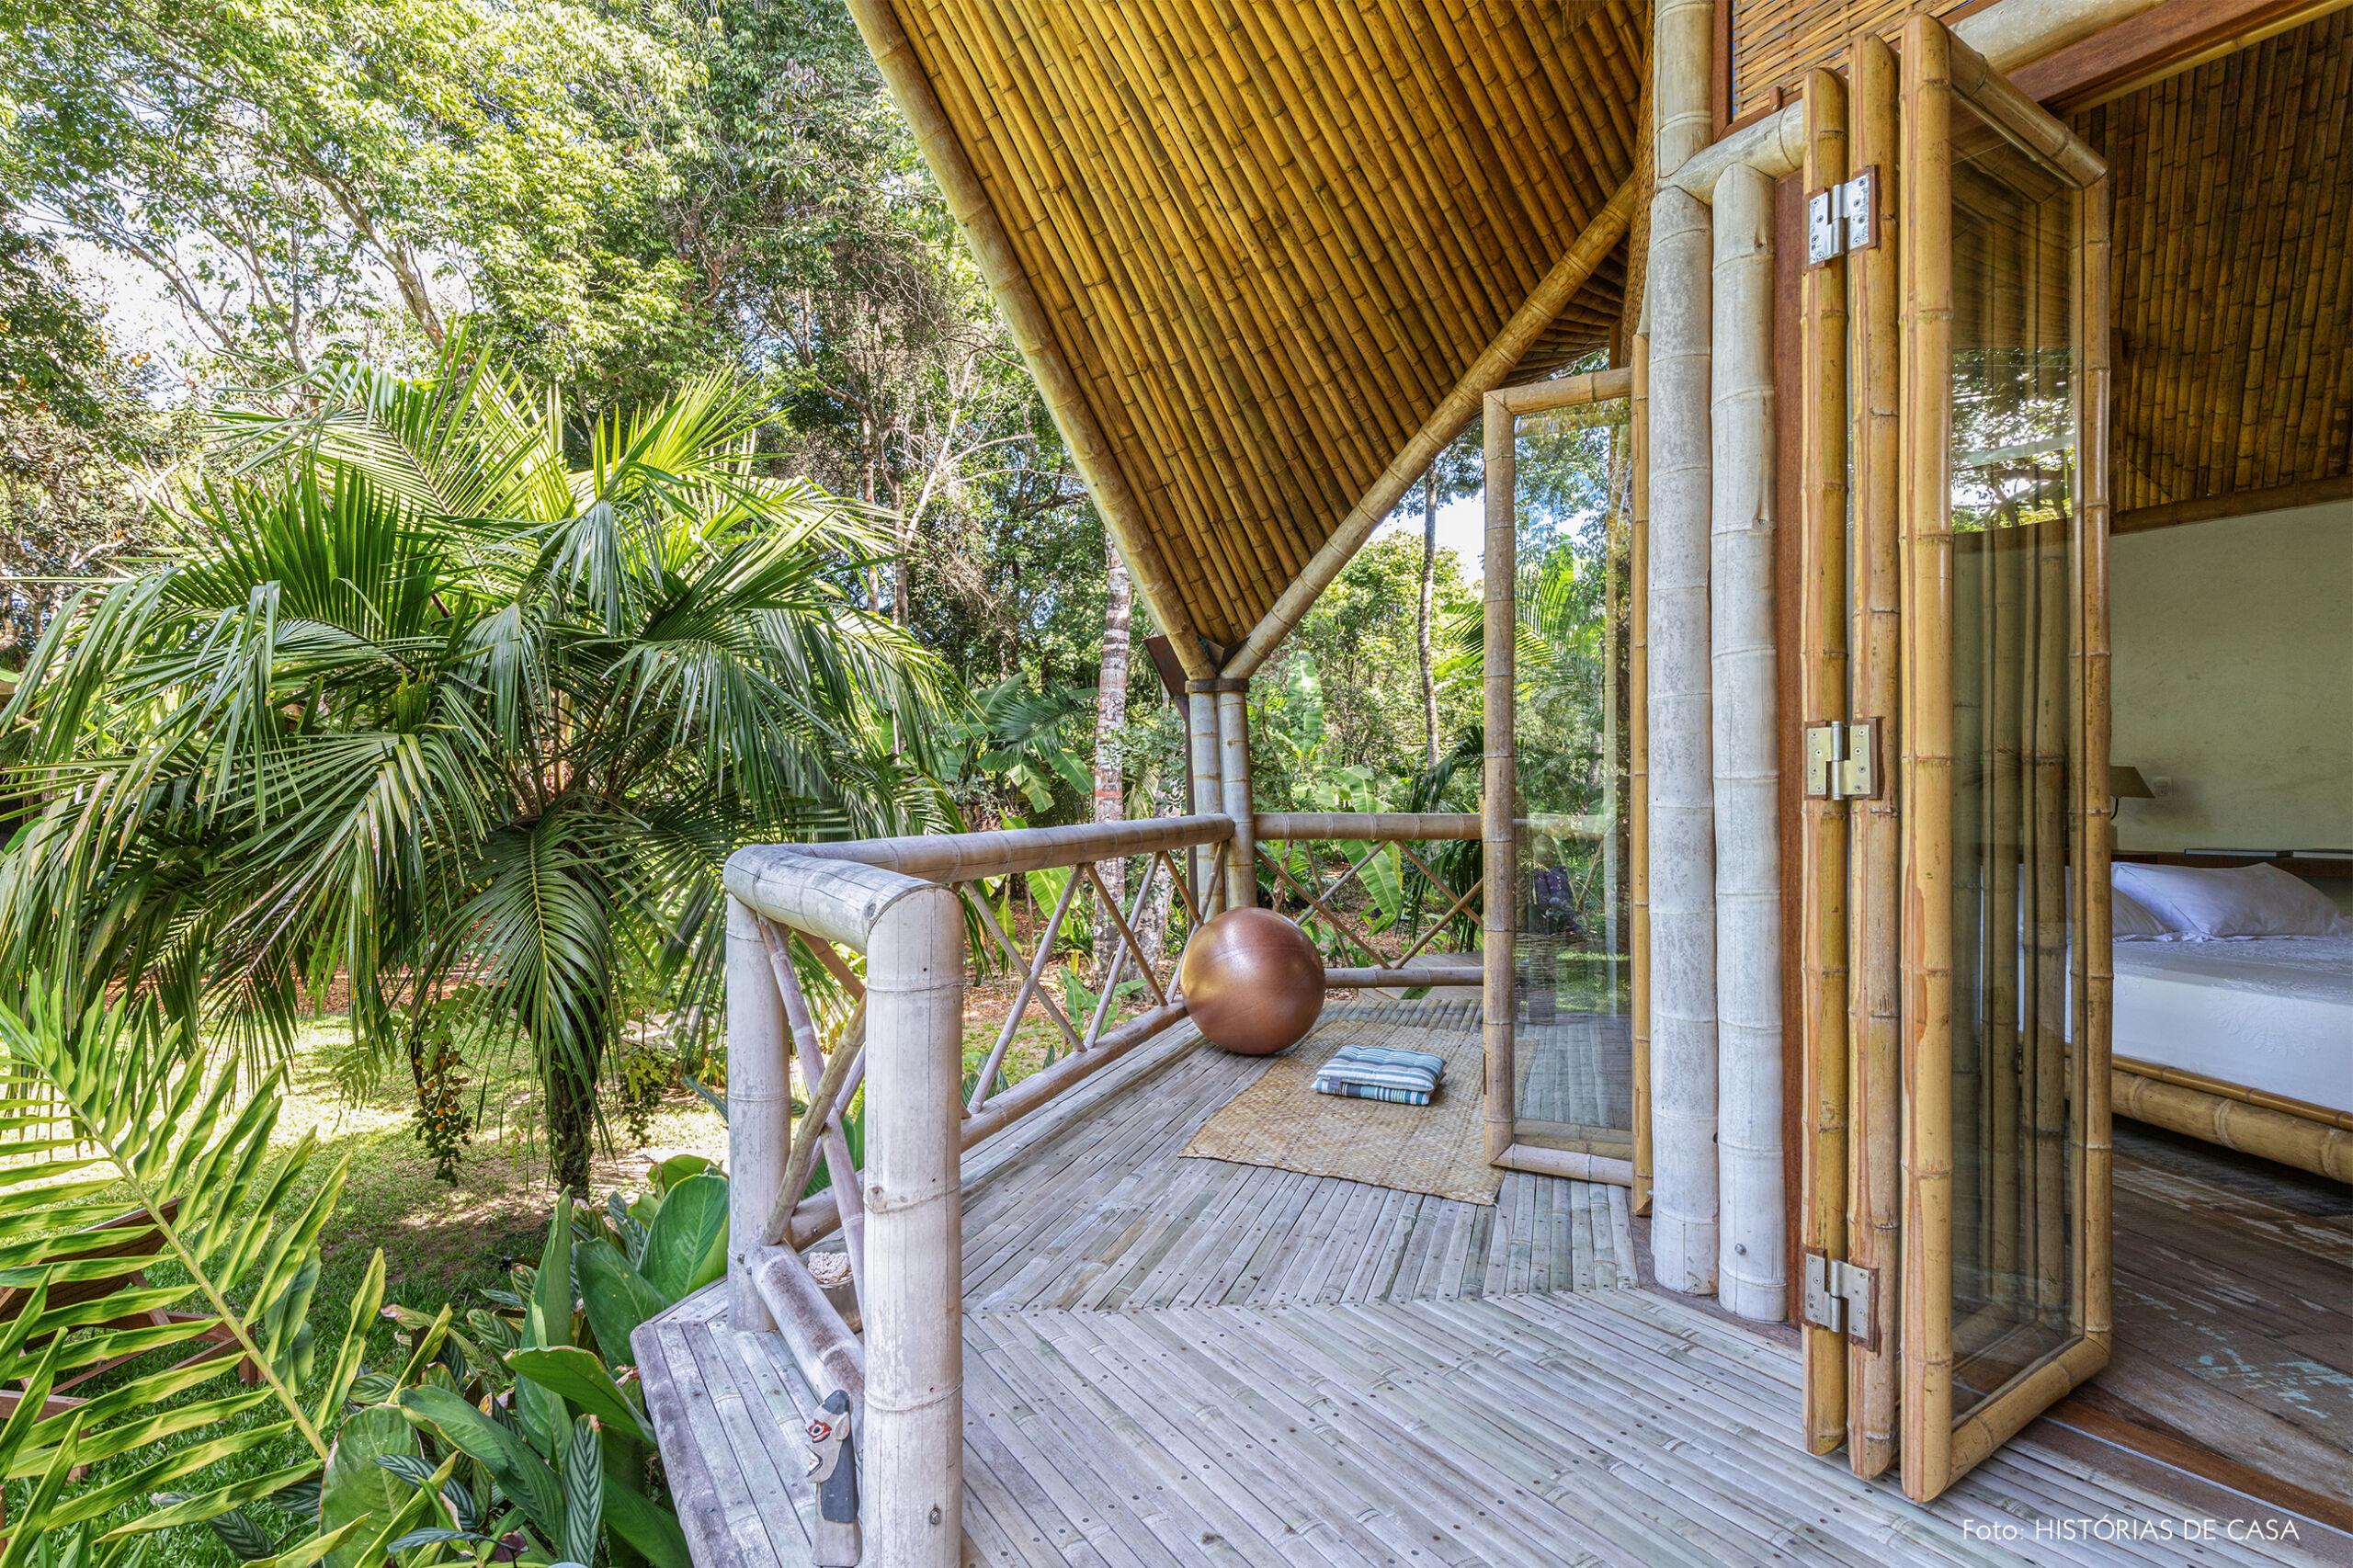 vilasete-hotel-decoracao-54-jardim-bambu-tapete-palha-cama-branca